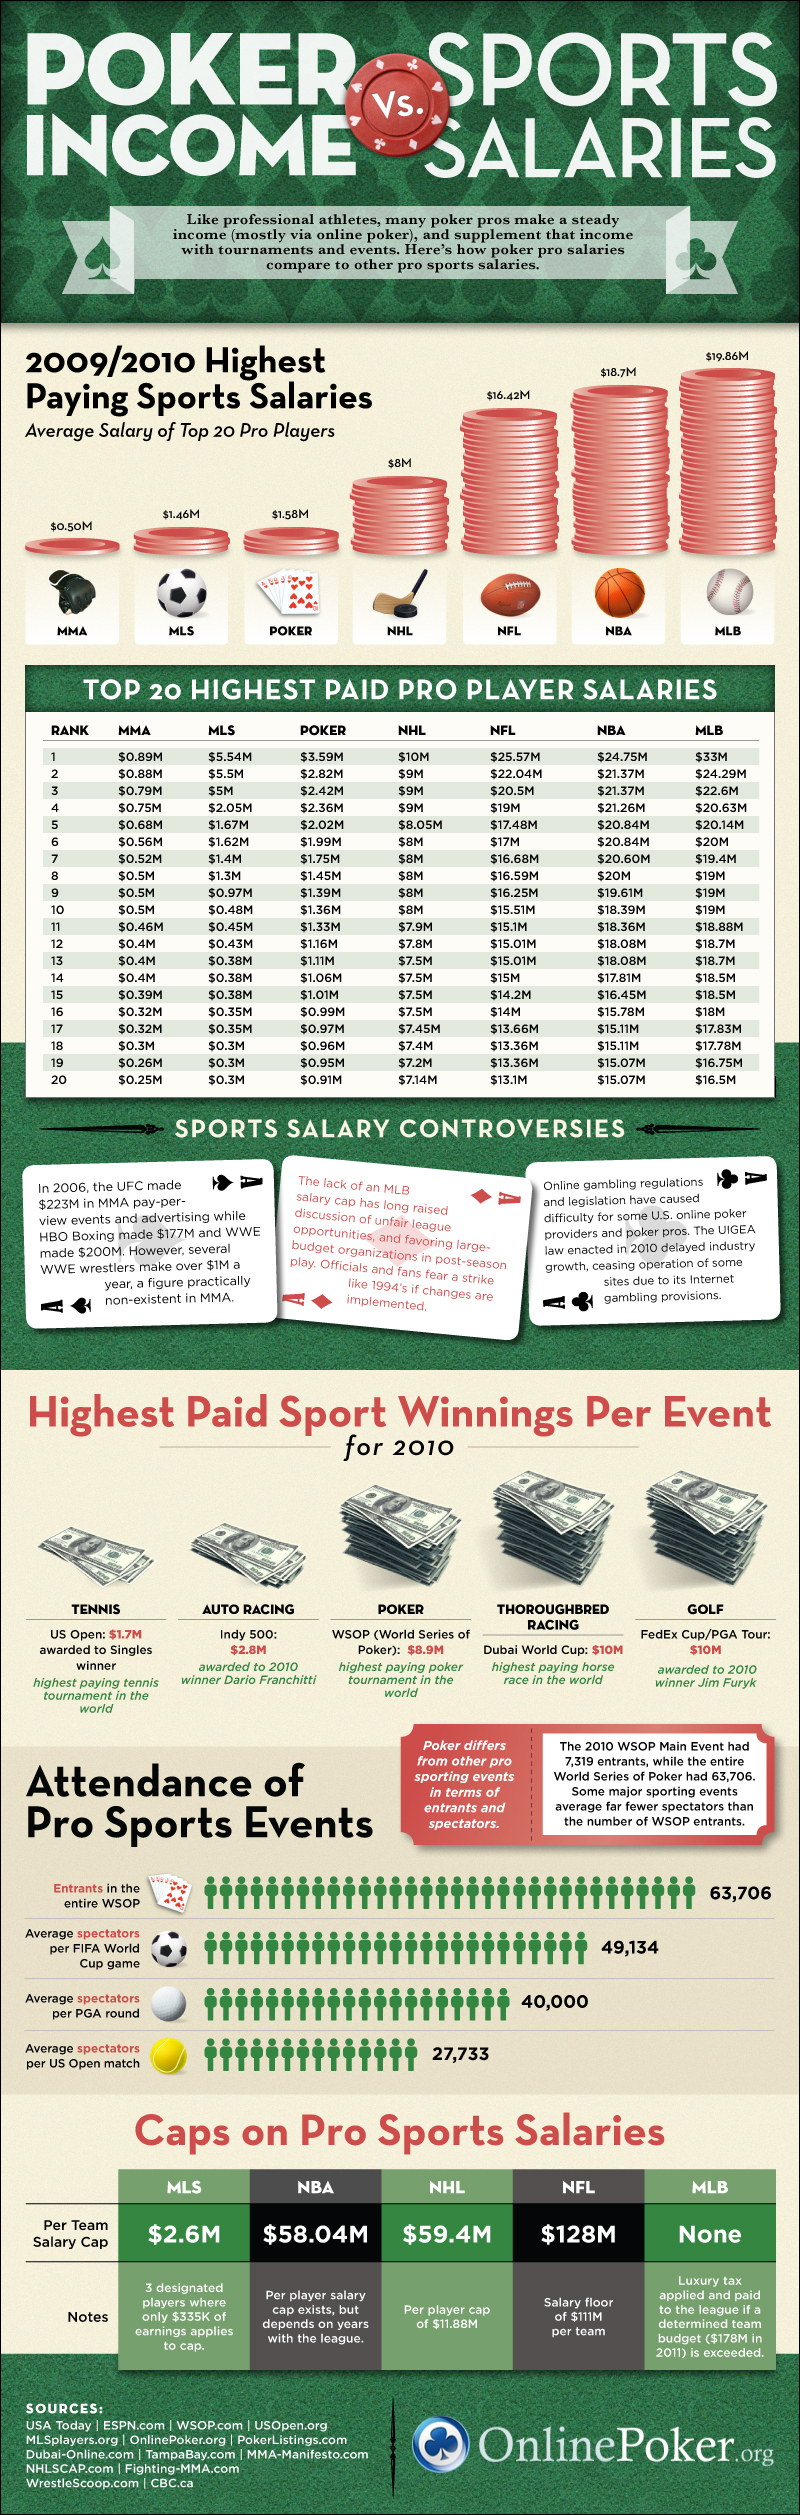 Poker Income vs Sports Salaries Infographic